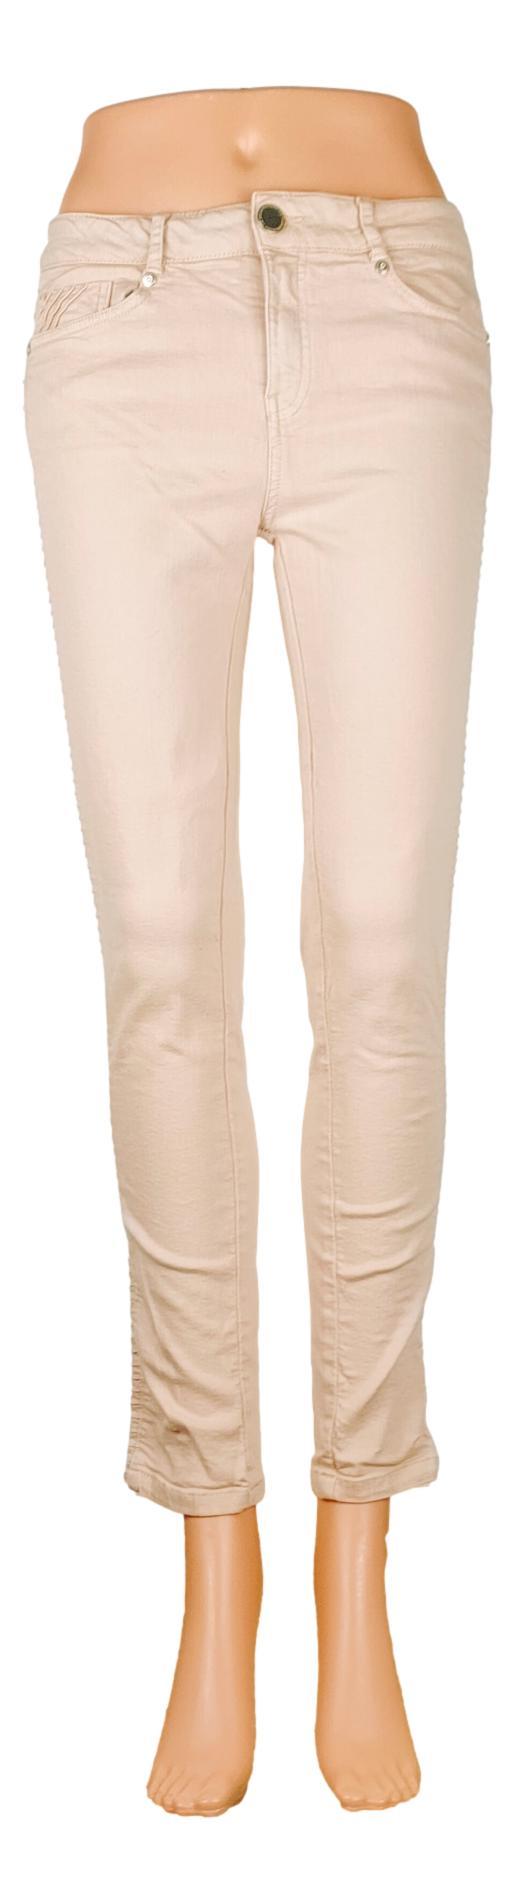 Pantalon Morgan - Taille 42